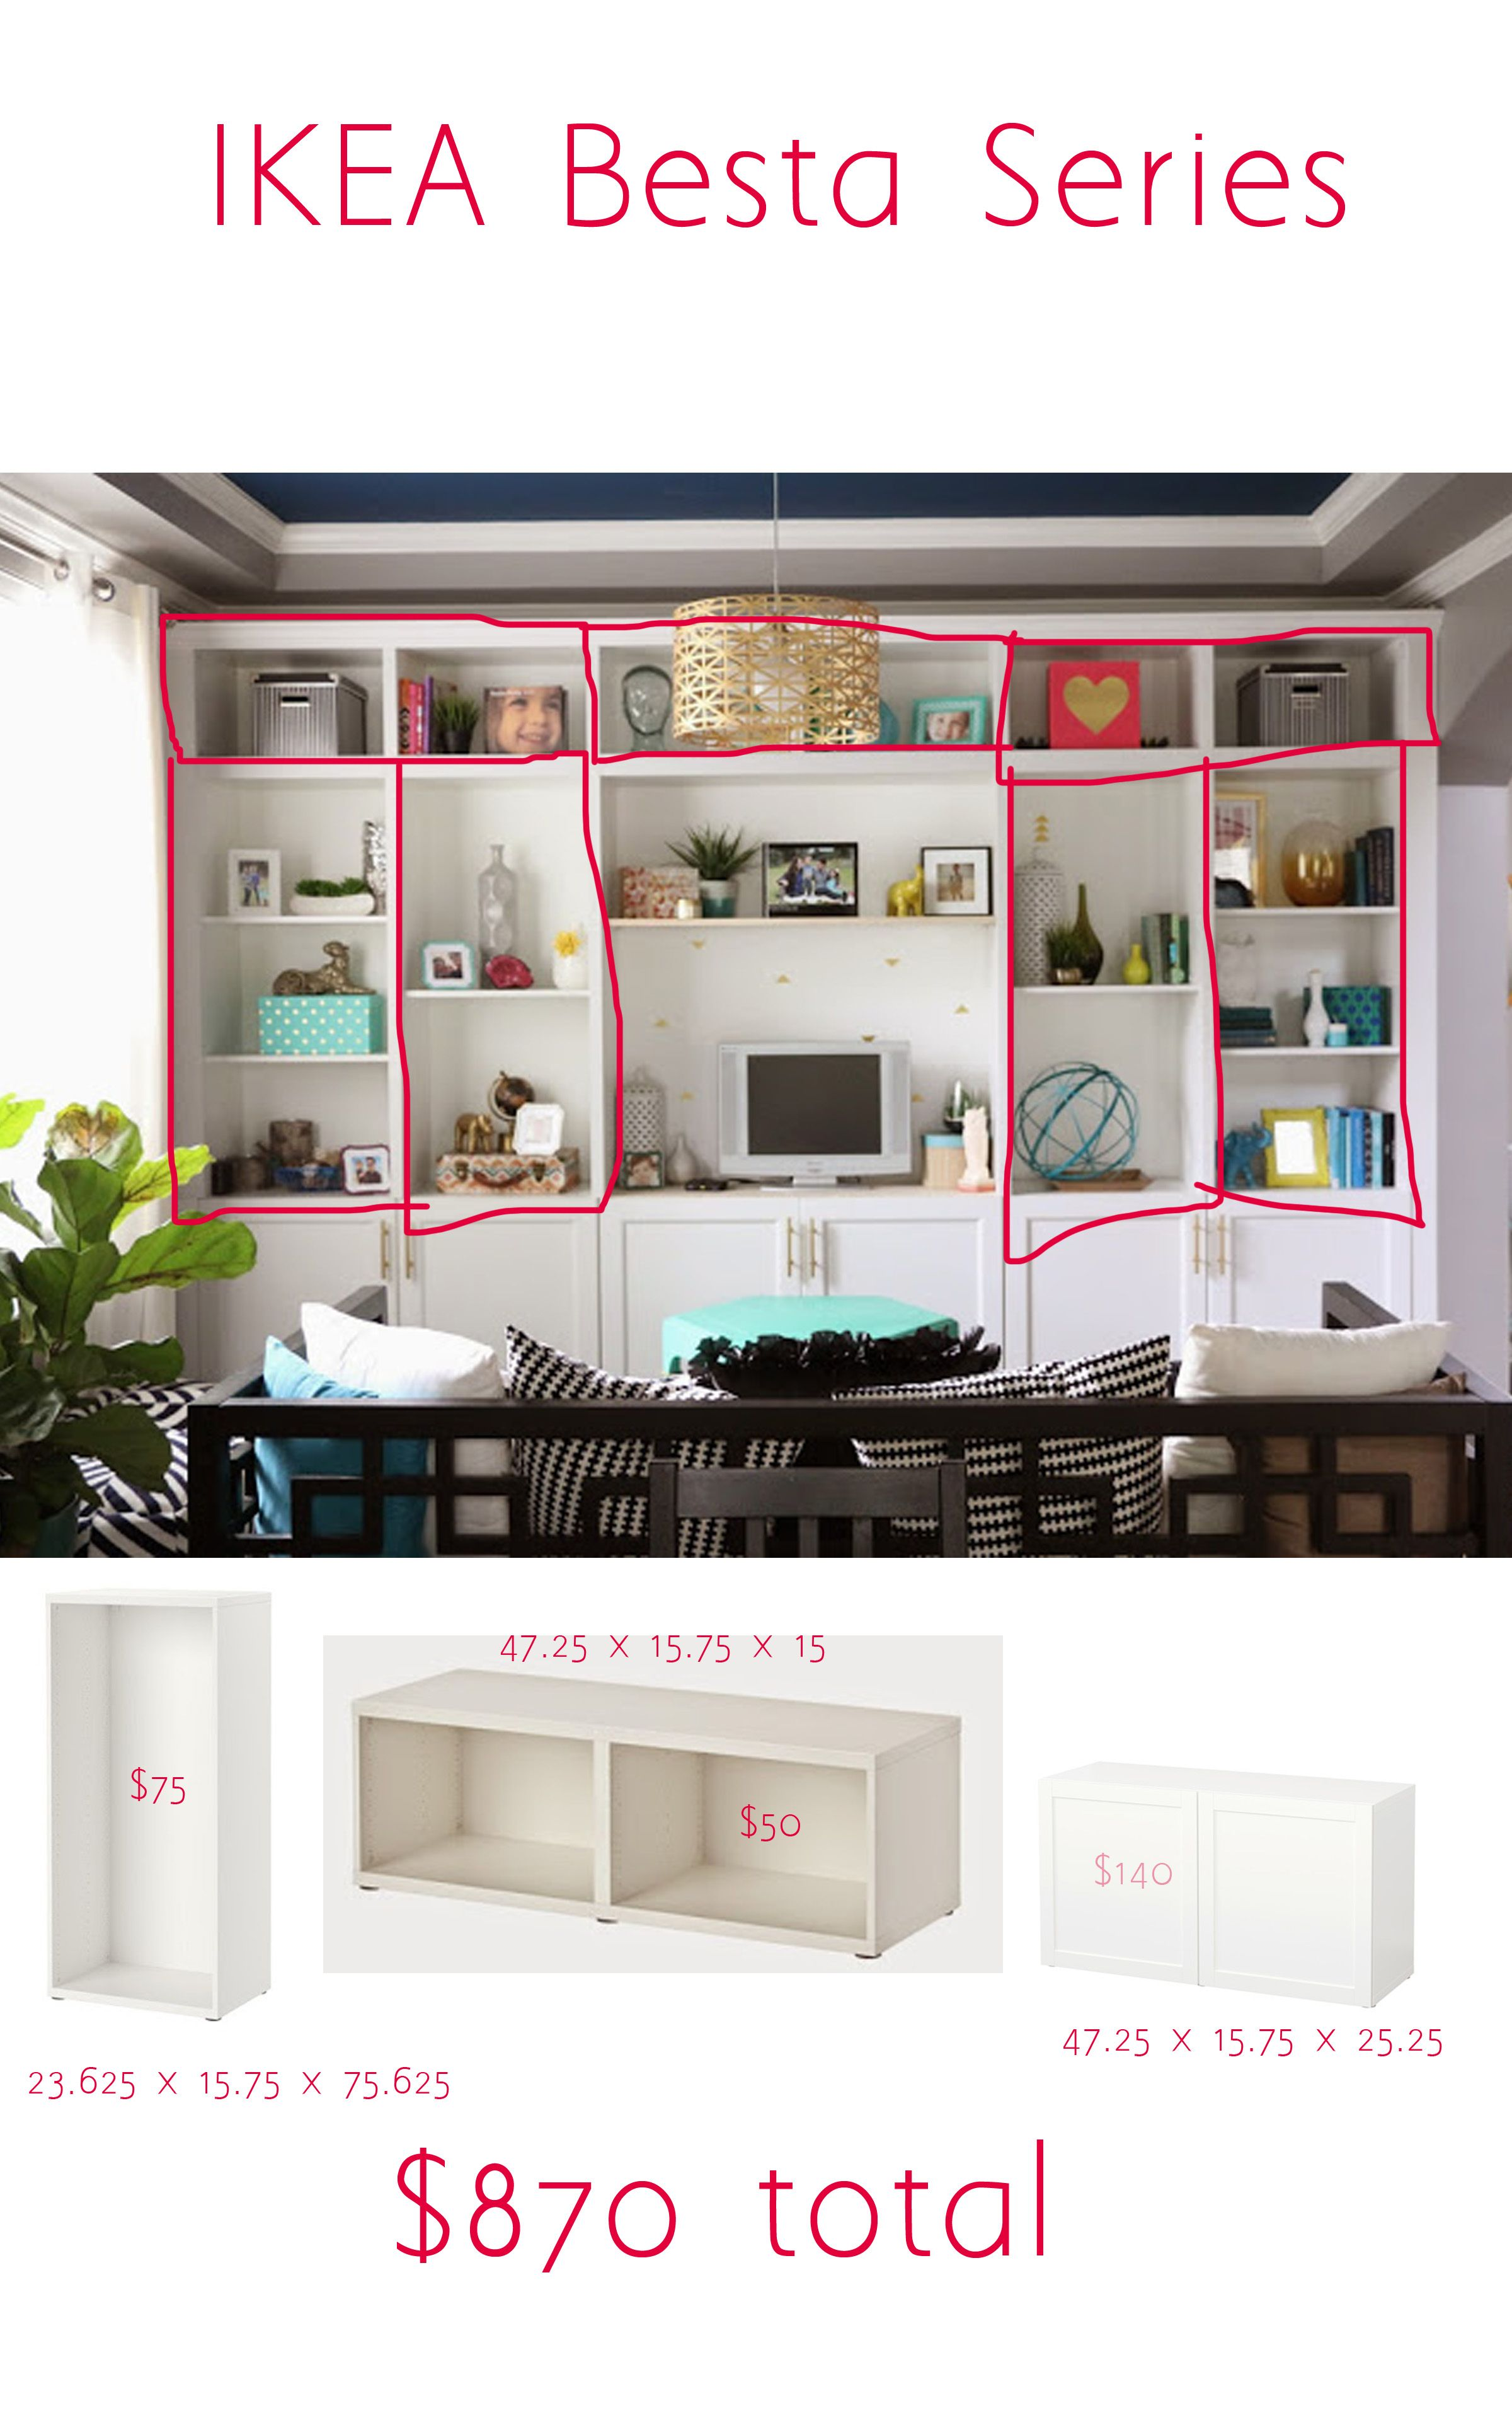 ikea besta built in p l a y r o o m in 2019. Black Bedroom Furniture Sets. Home Design Ideas